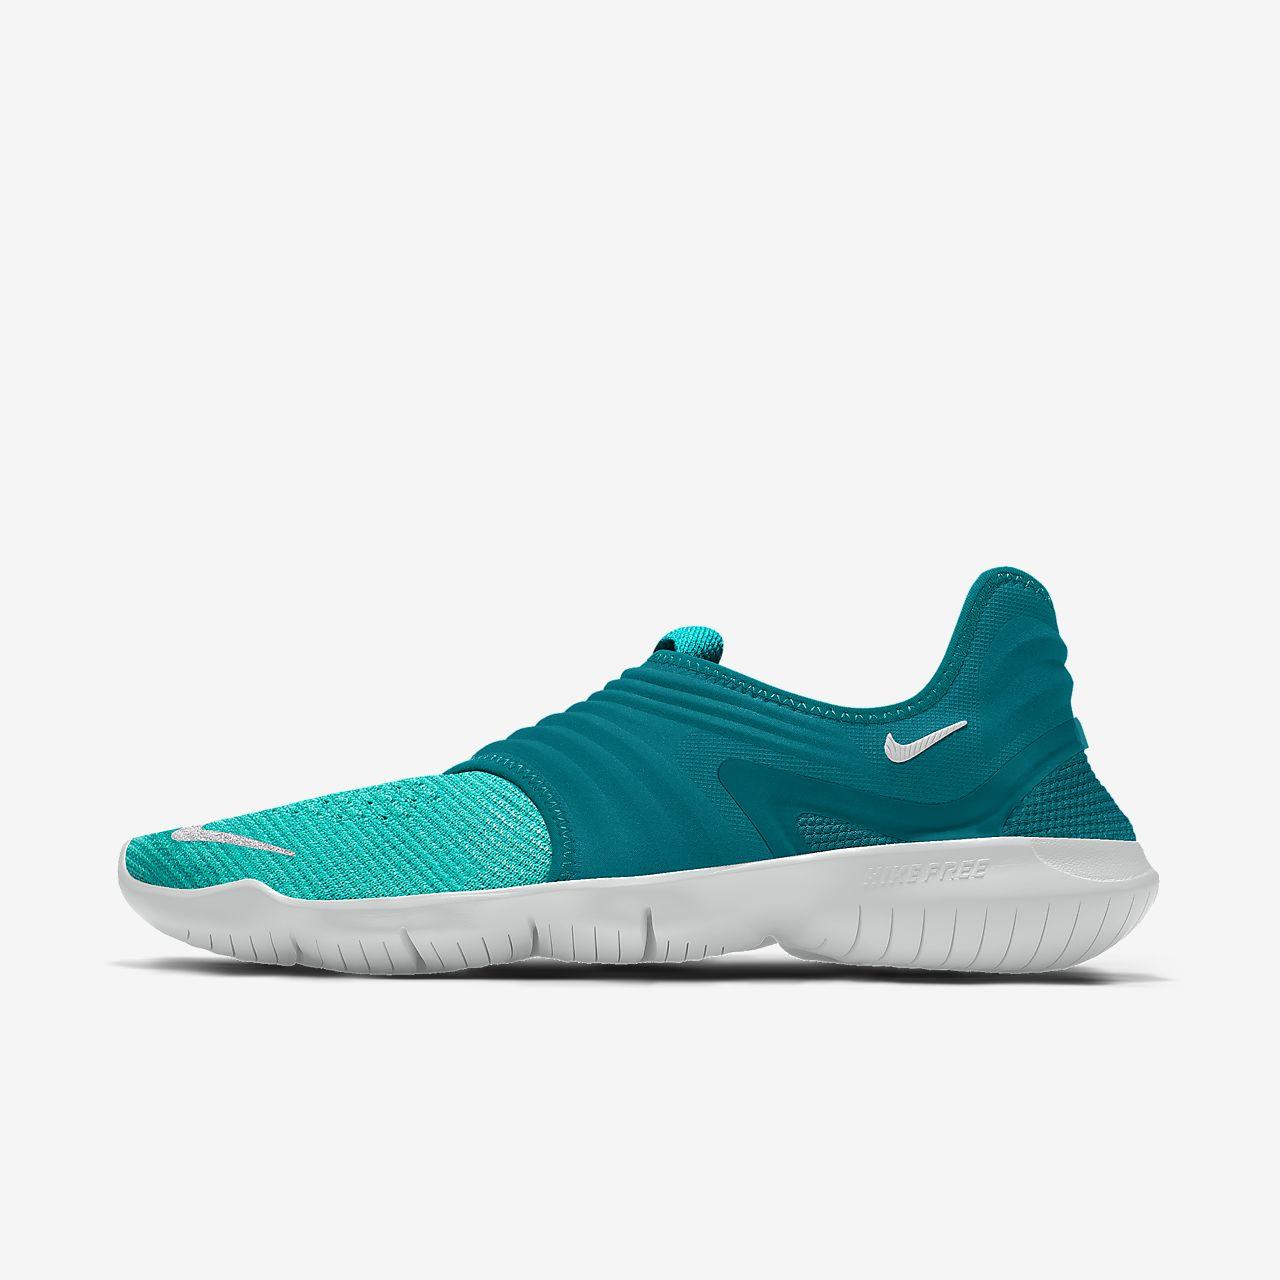 Nike Free RN Flyknit 3.0 By You Custom Women's Running Shoe